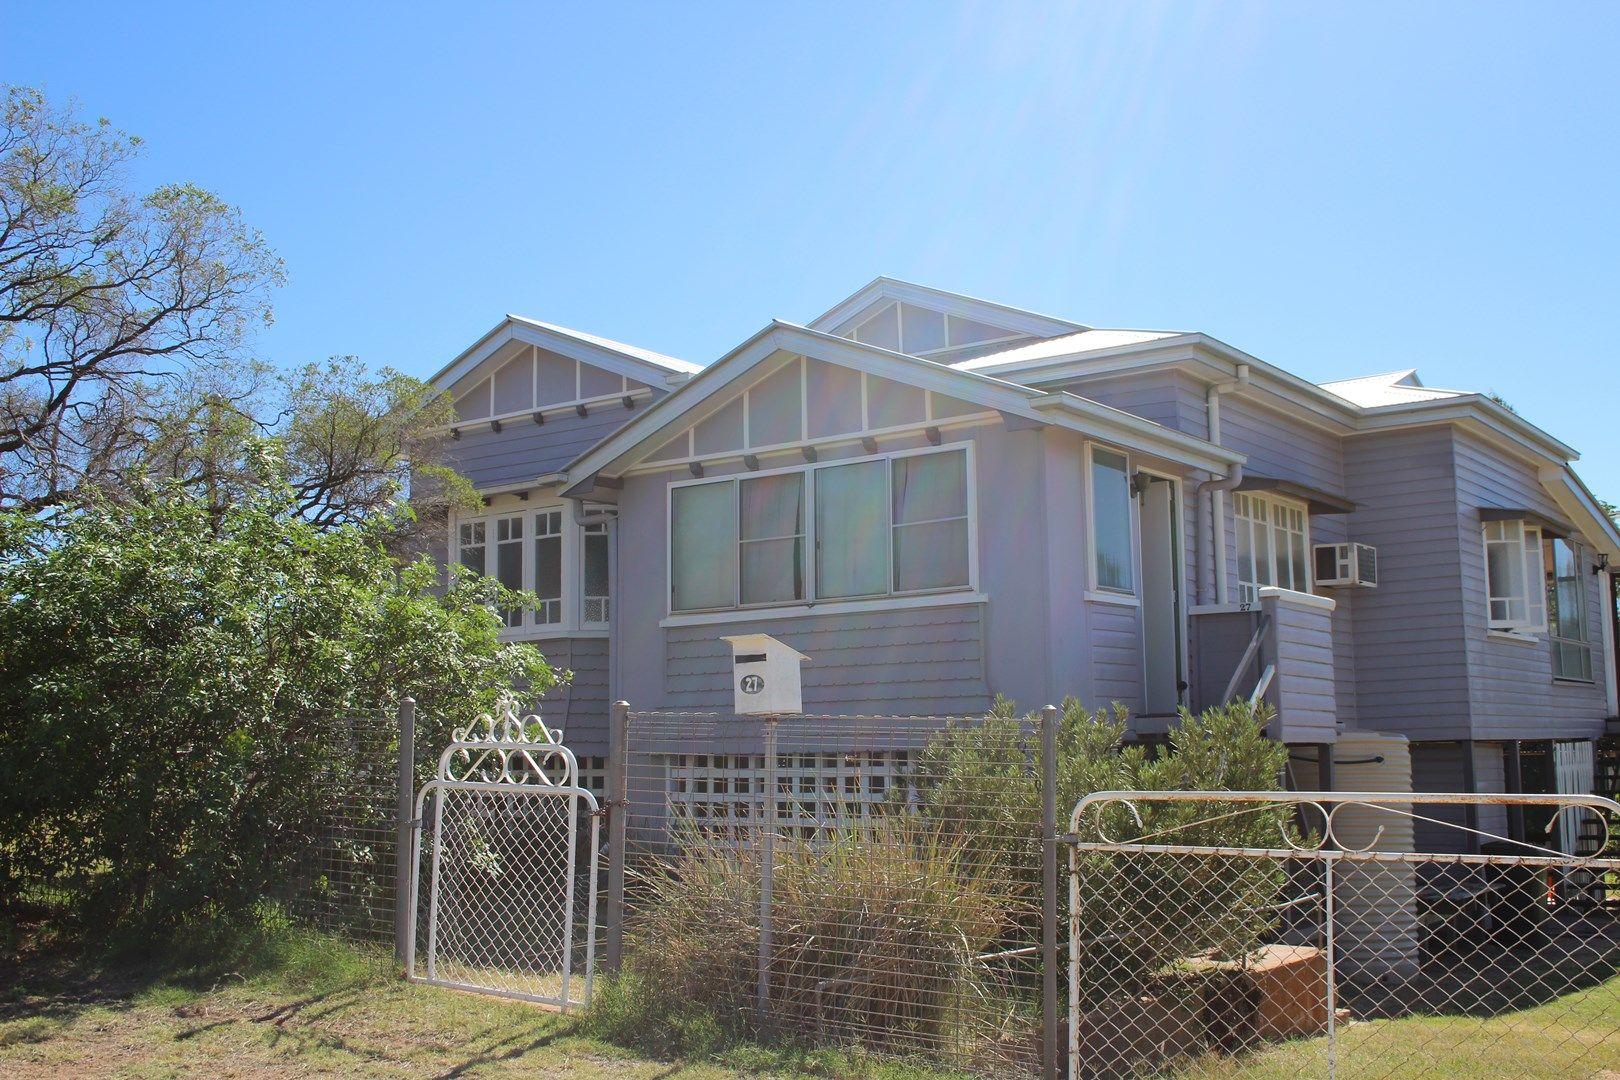 27 Eyre Street, Charleville QLD 4470, Image 0